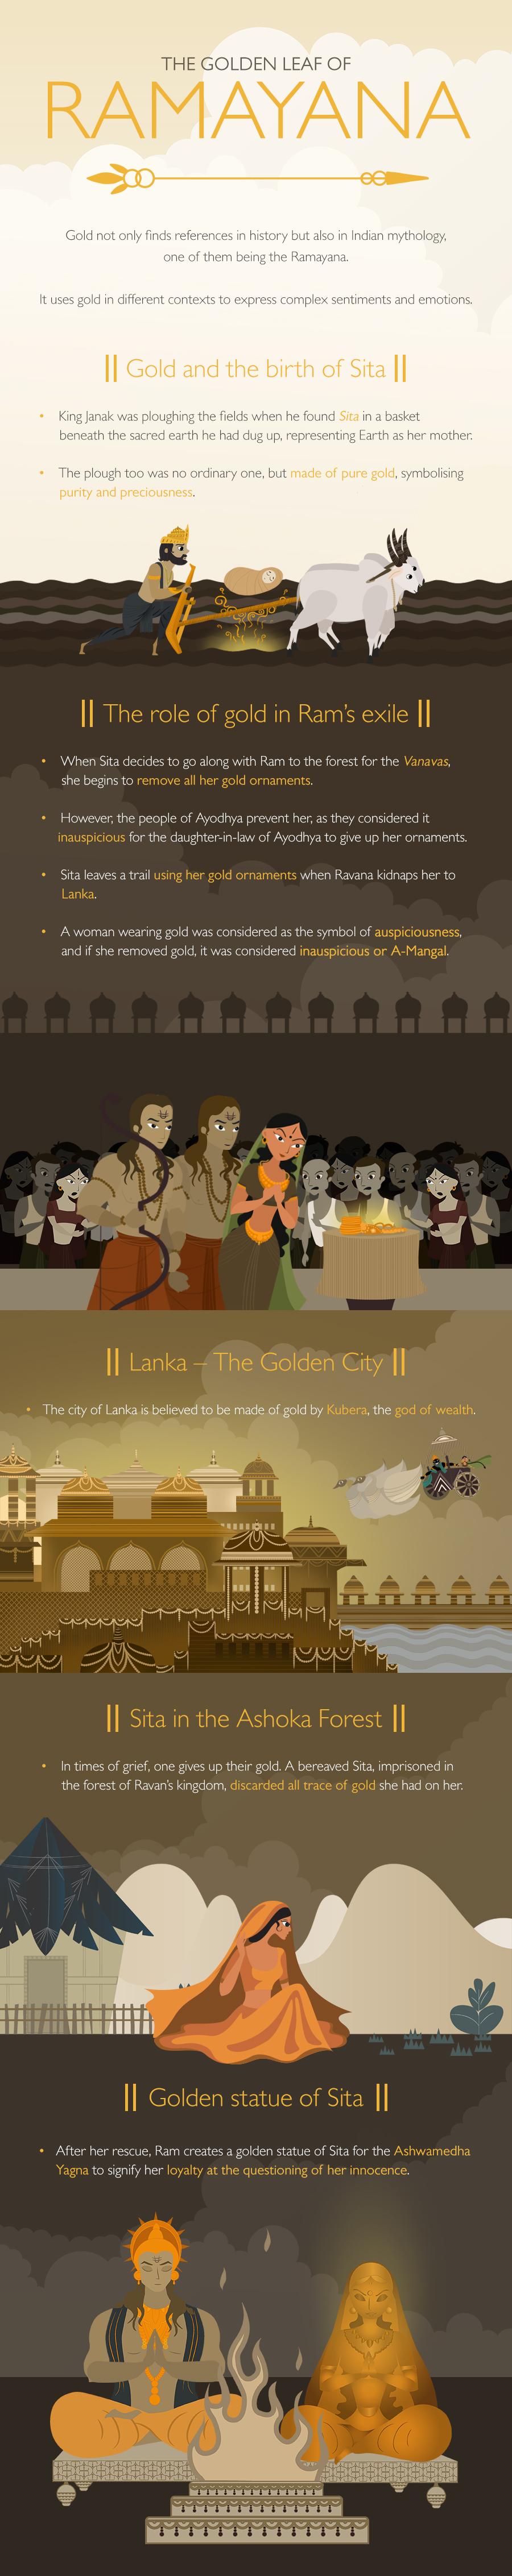 Ramayana Gold